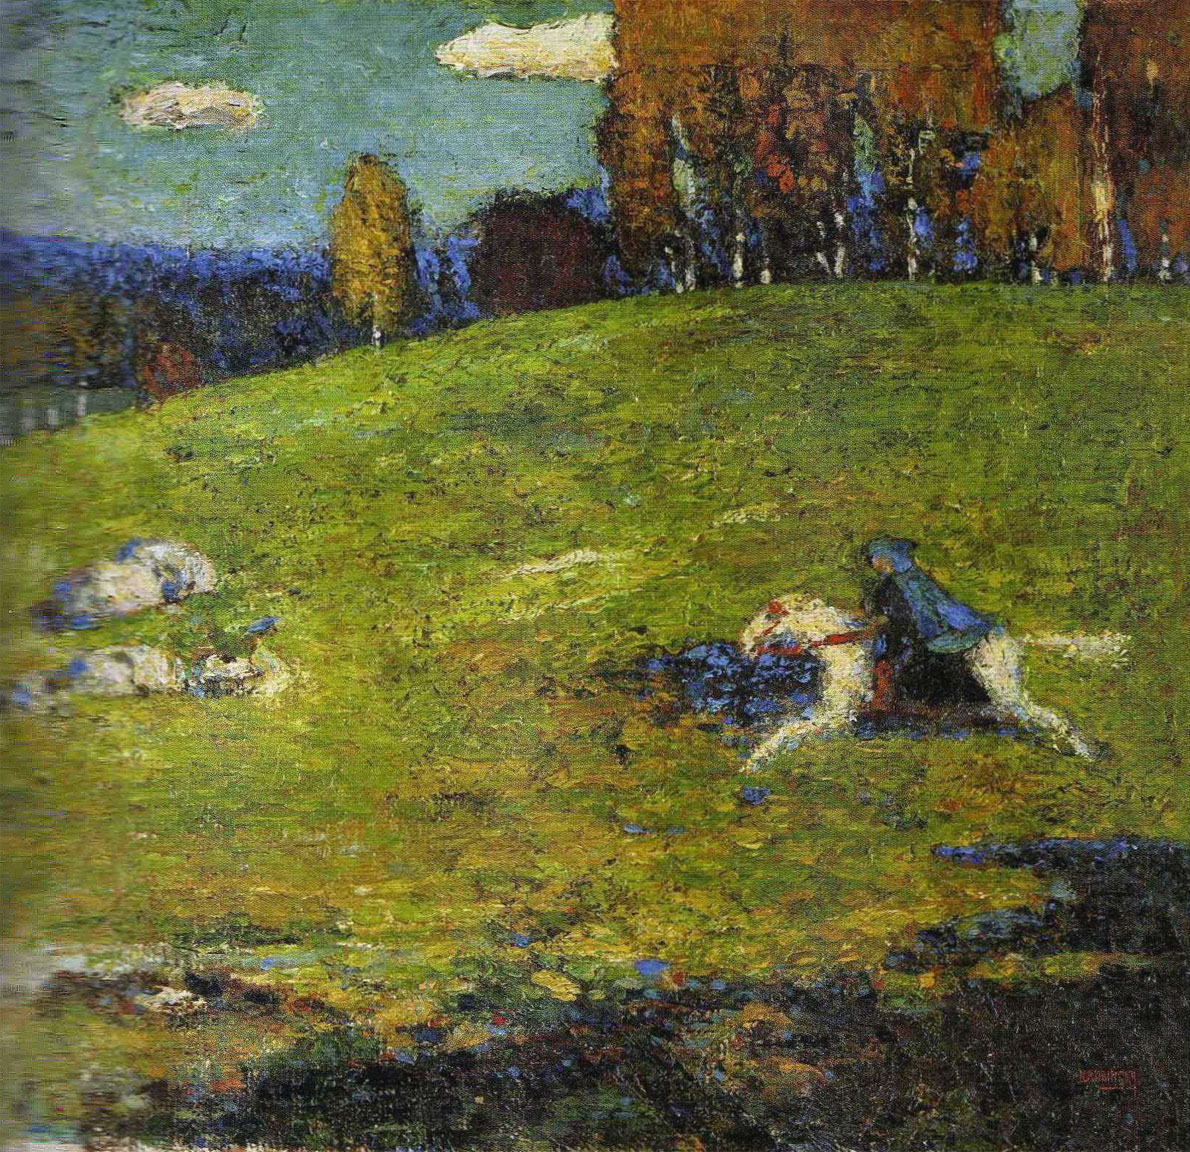 Cavaliere azzurro - Kandinsky